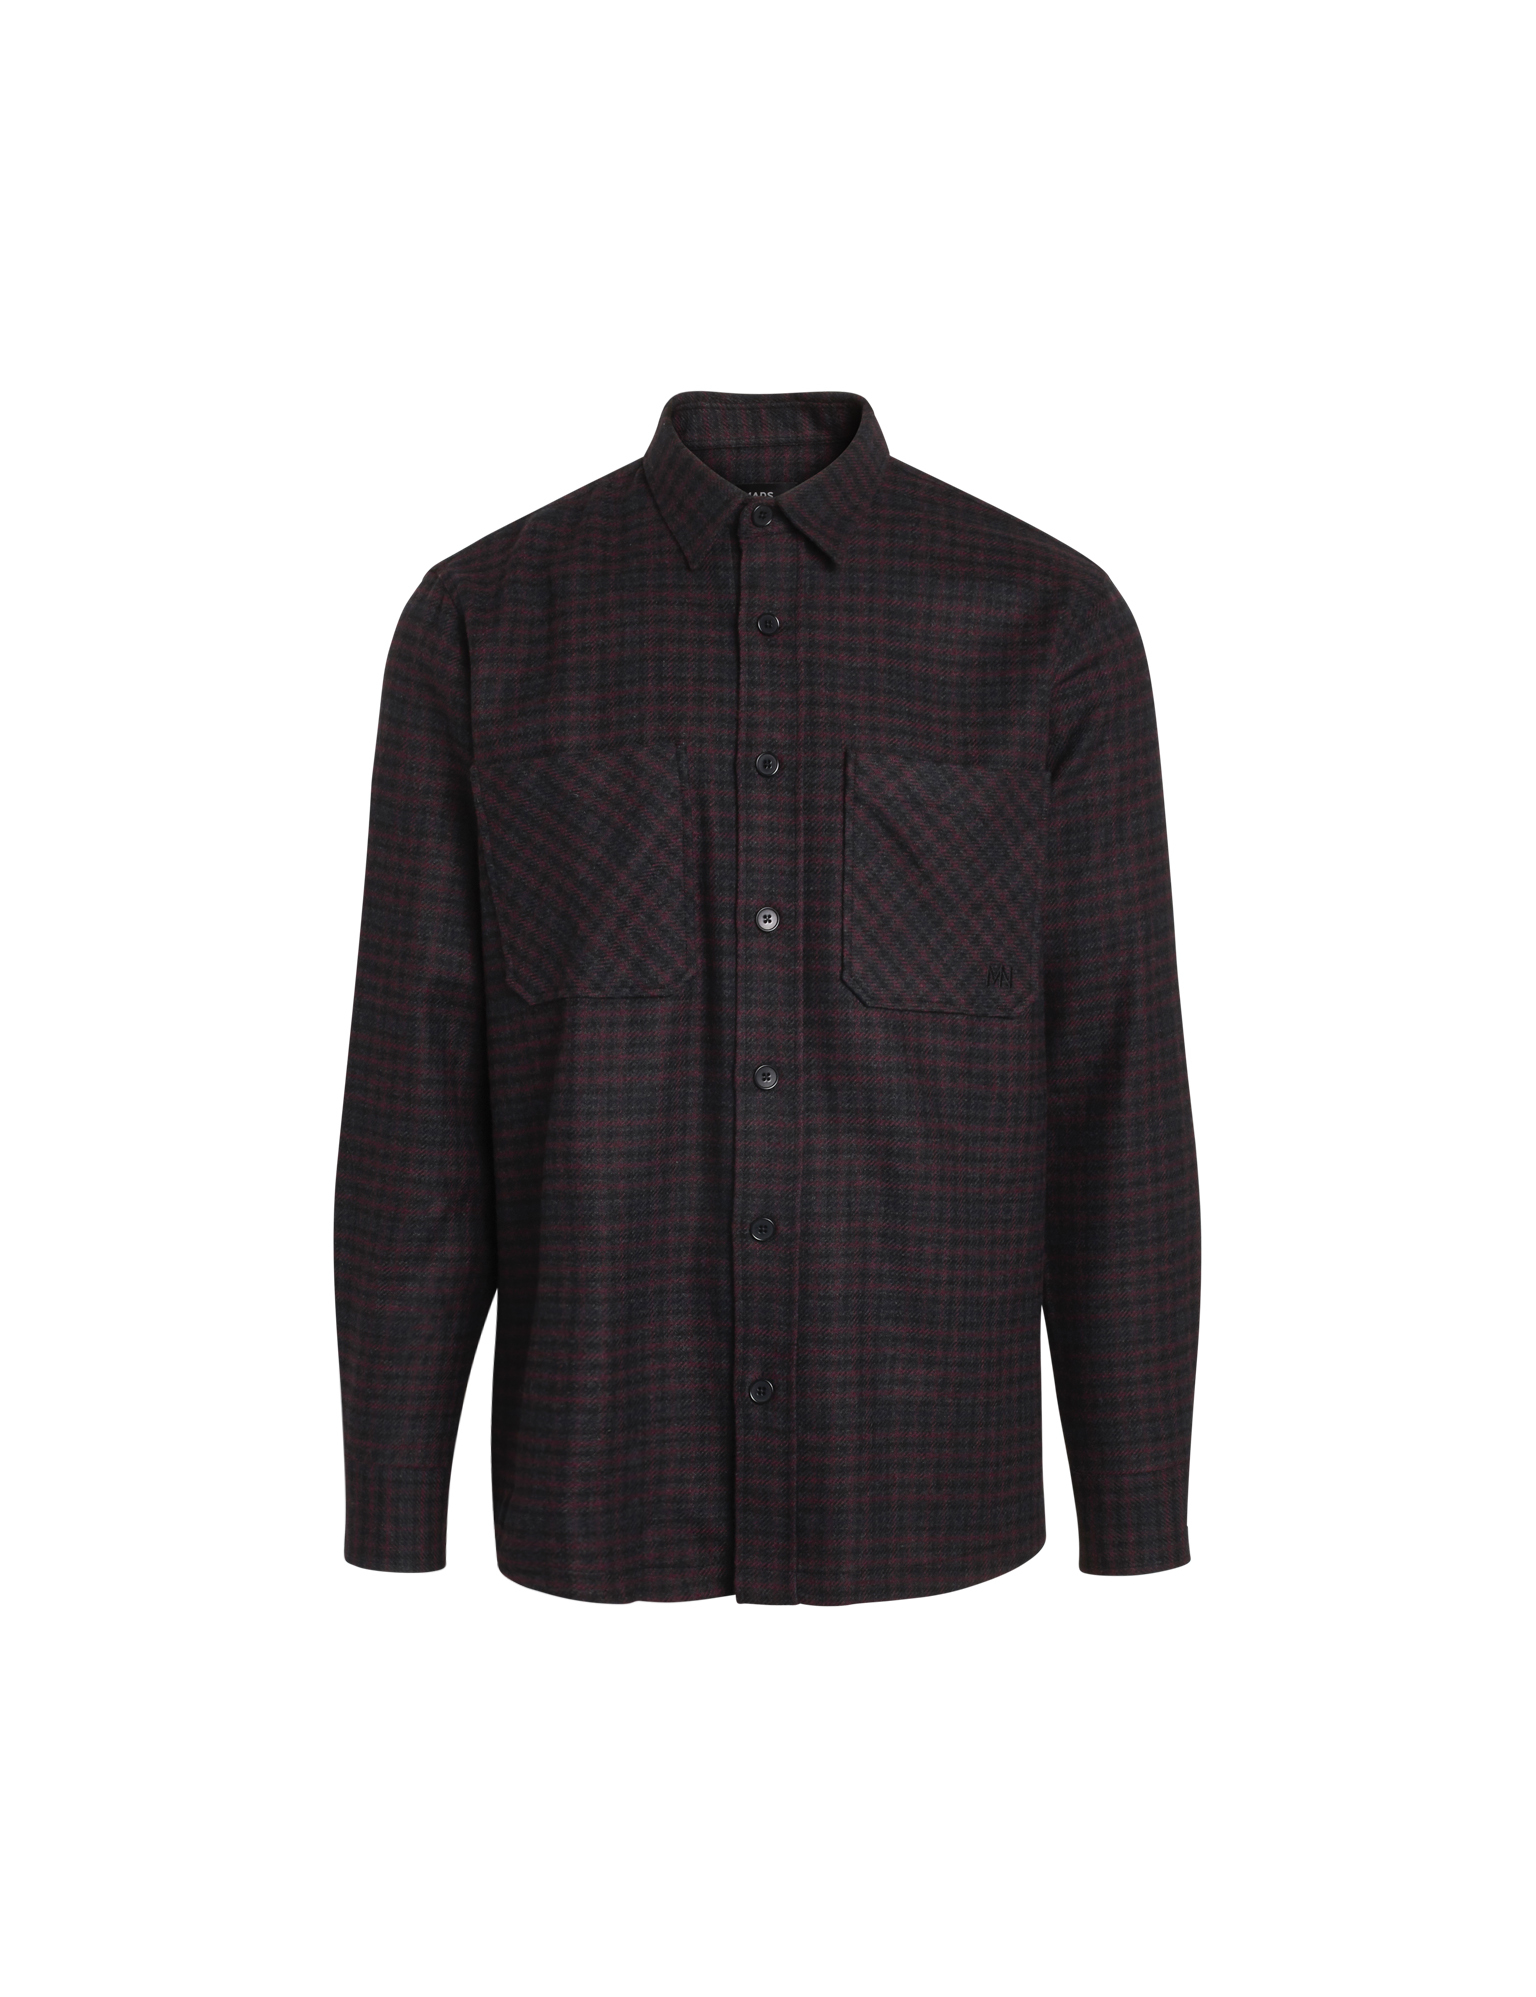 Mads Nørgaard Lema Blend Sapp skjorte, grey check, S